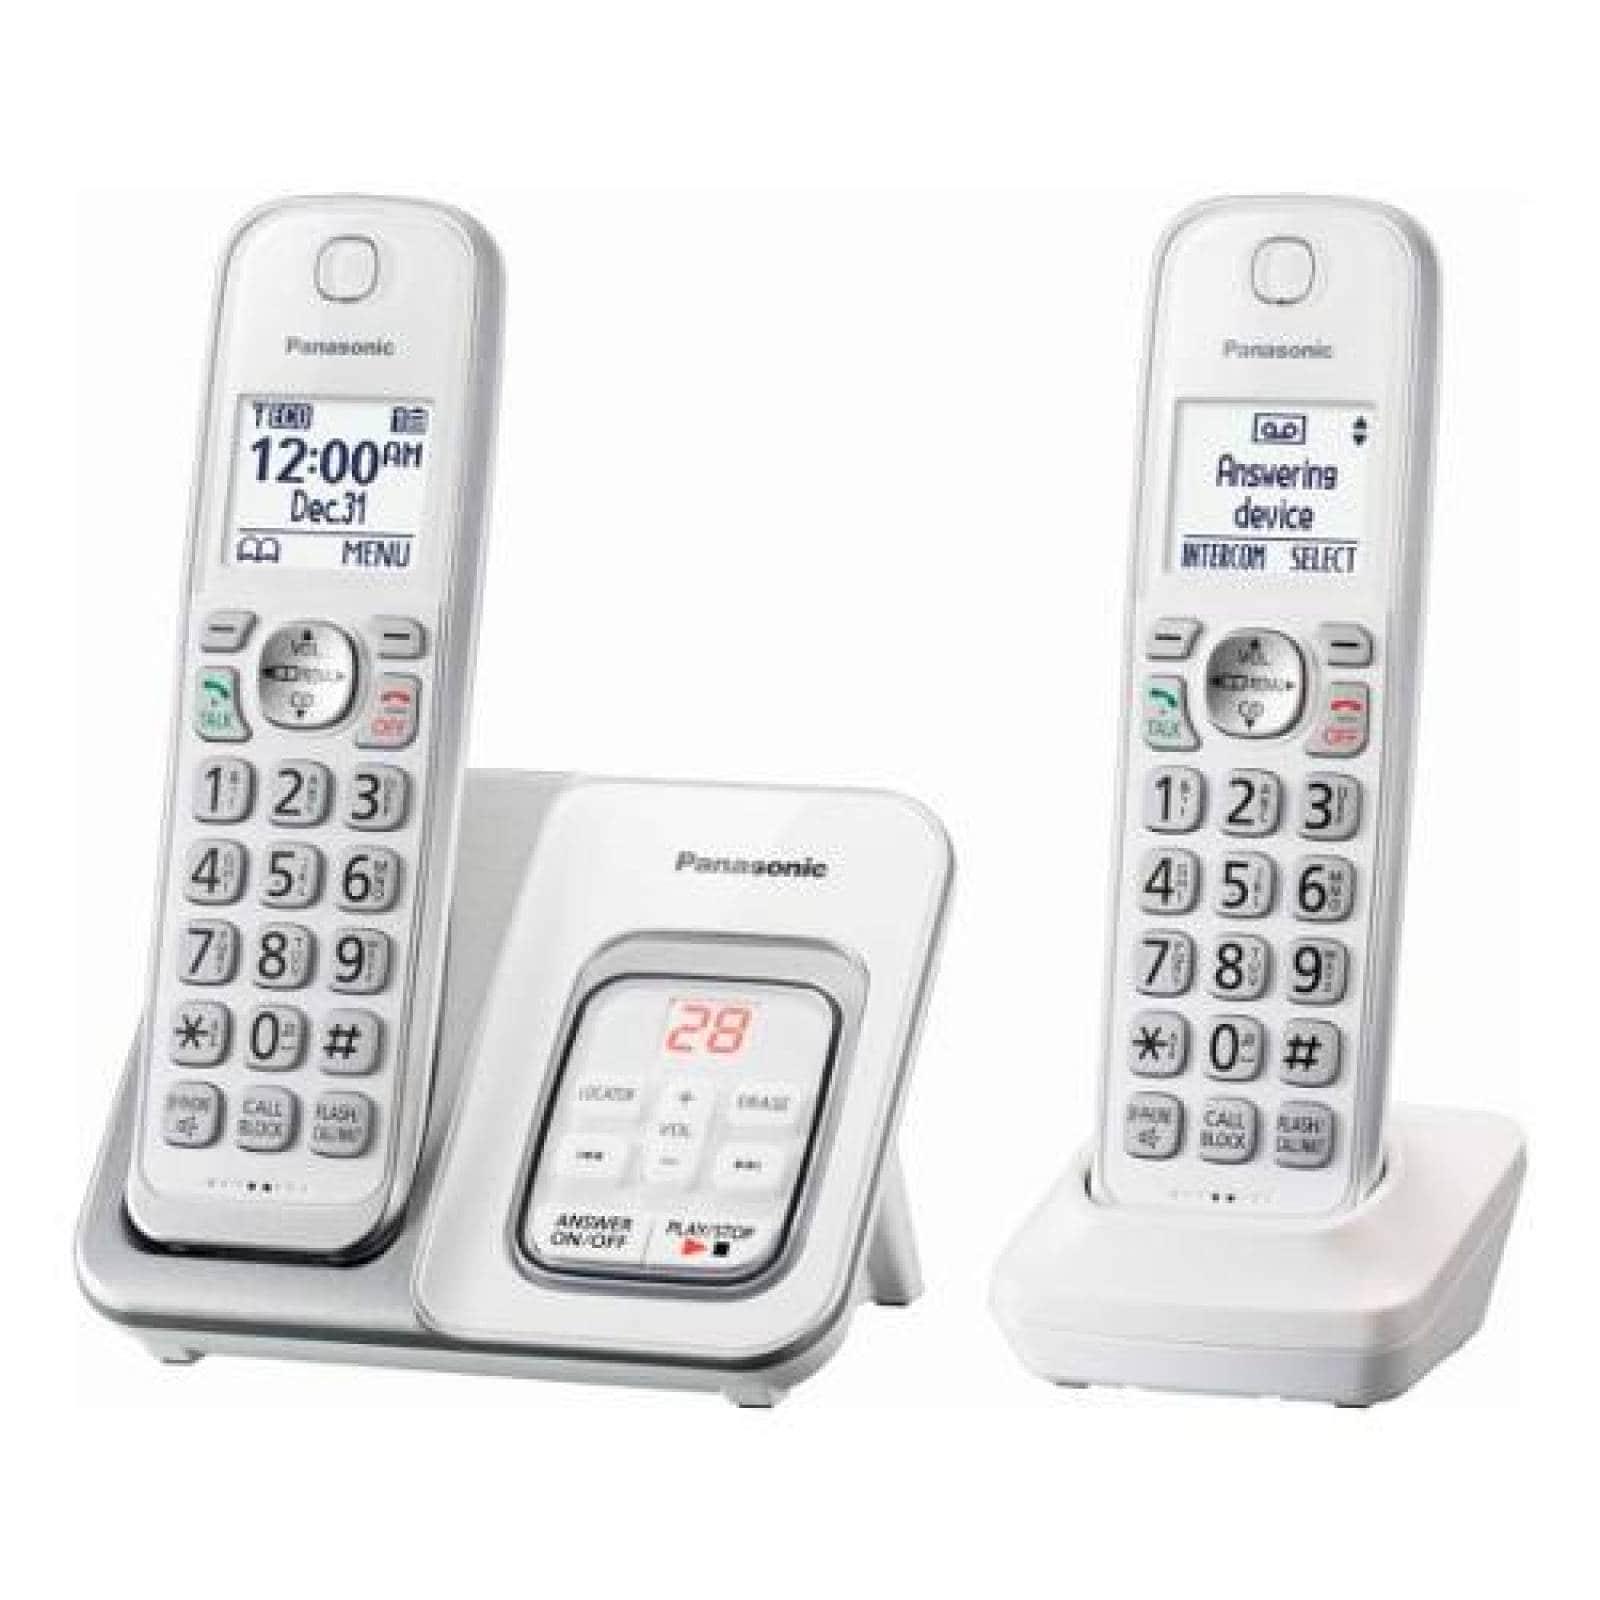 Telefono Panasonic Inalambrico TGD532 Reacondicionado